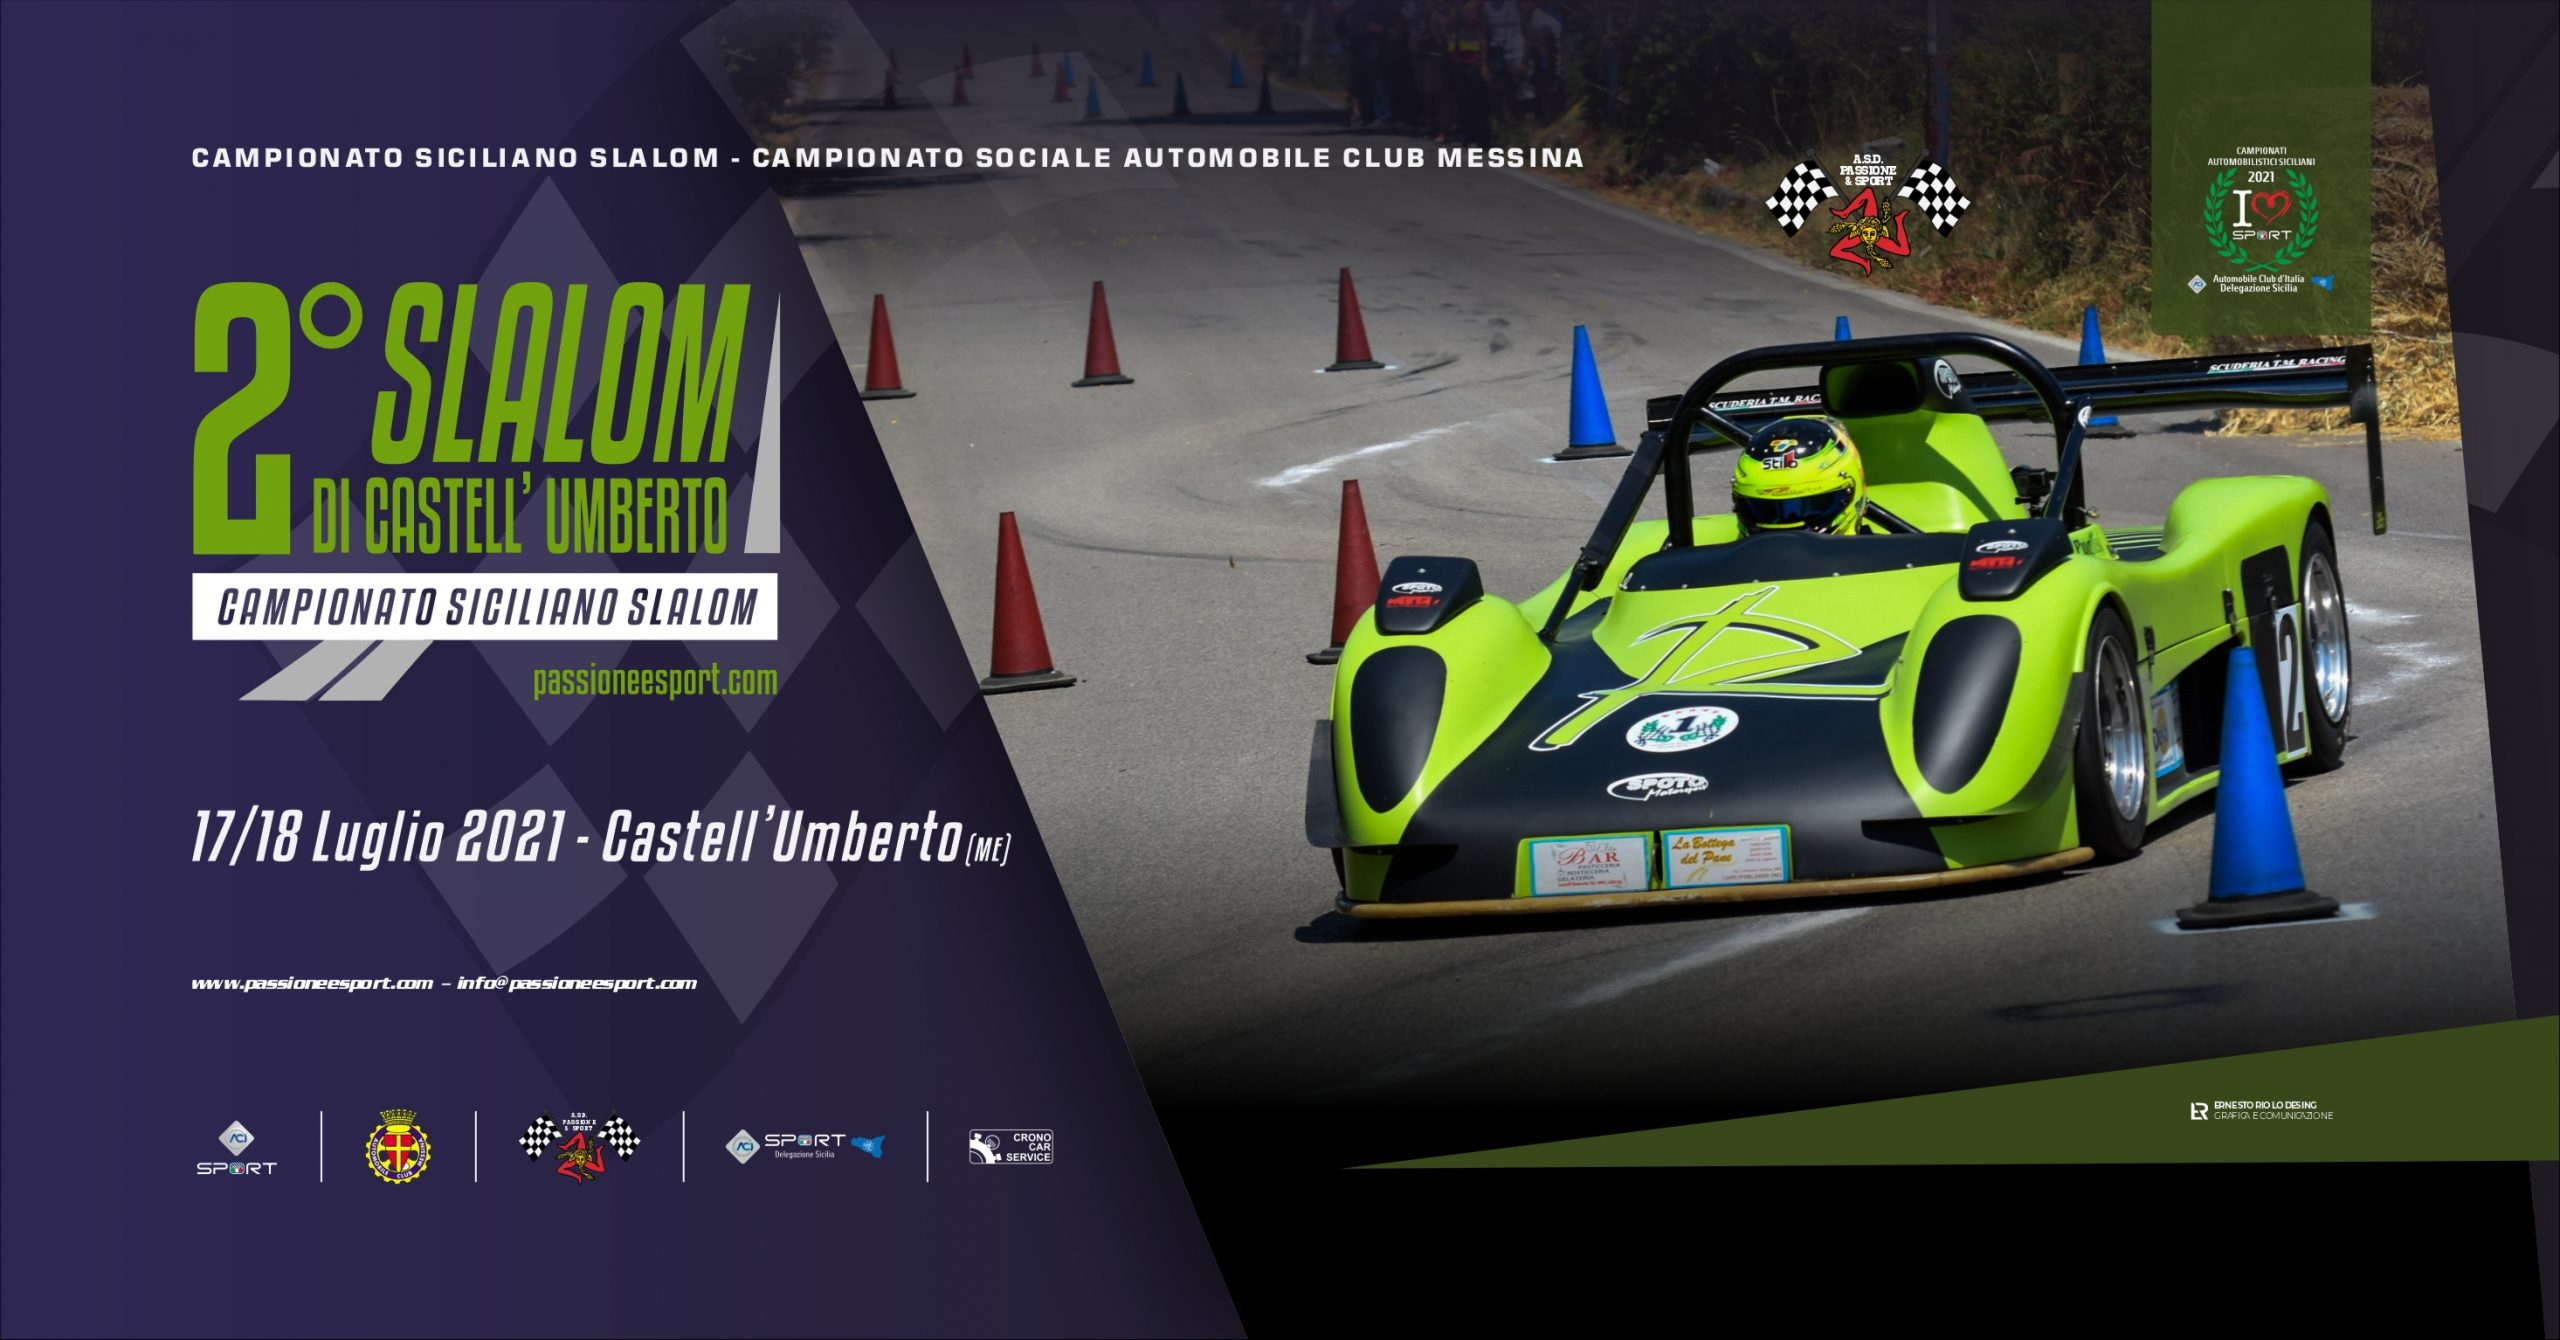 2° Slalom di Castell'Umberto